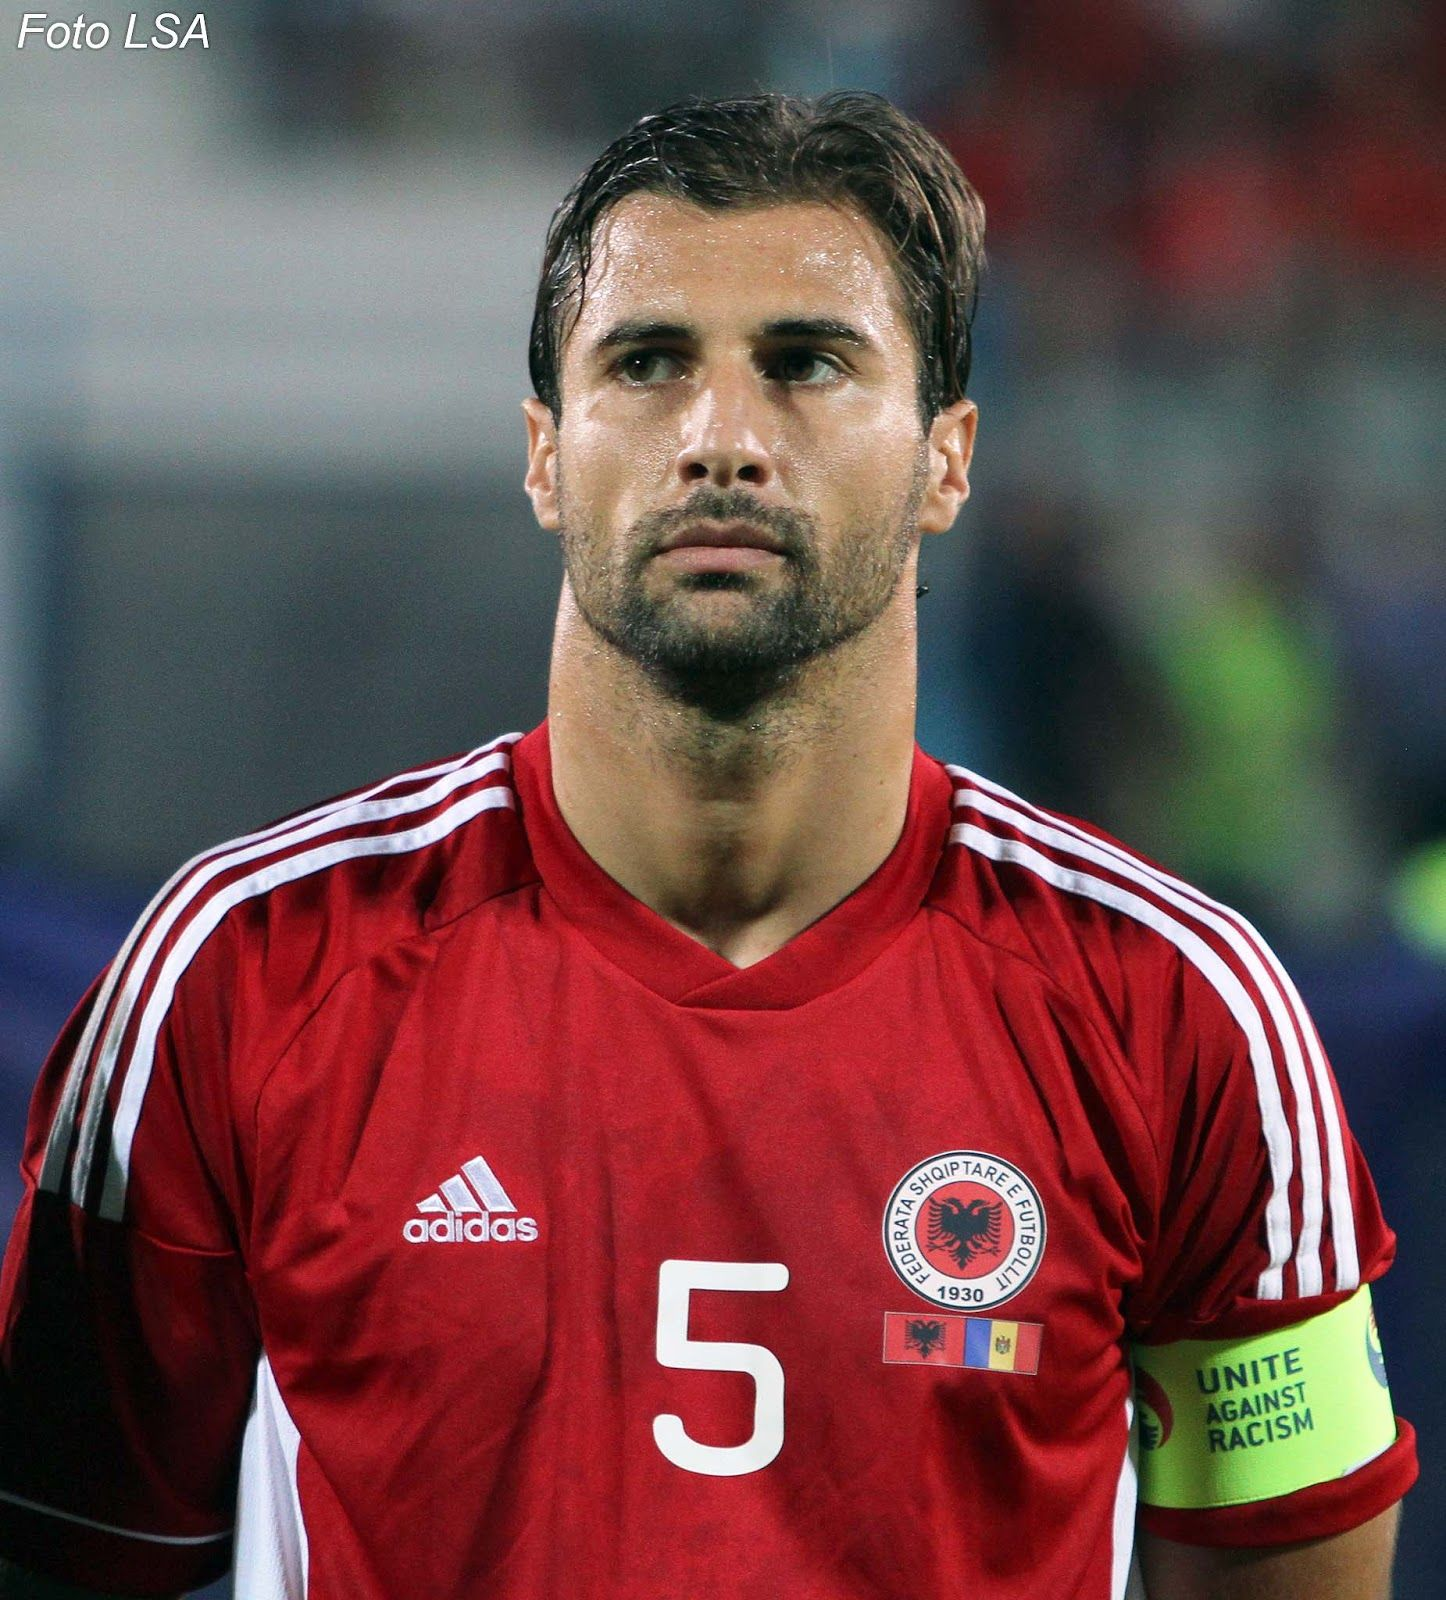 Lorik Cana Albania. Captain of the national team, a